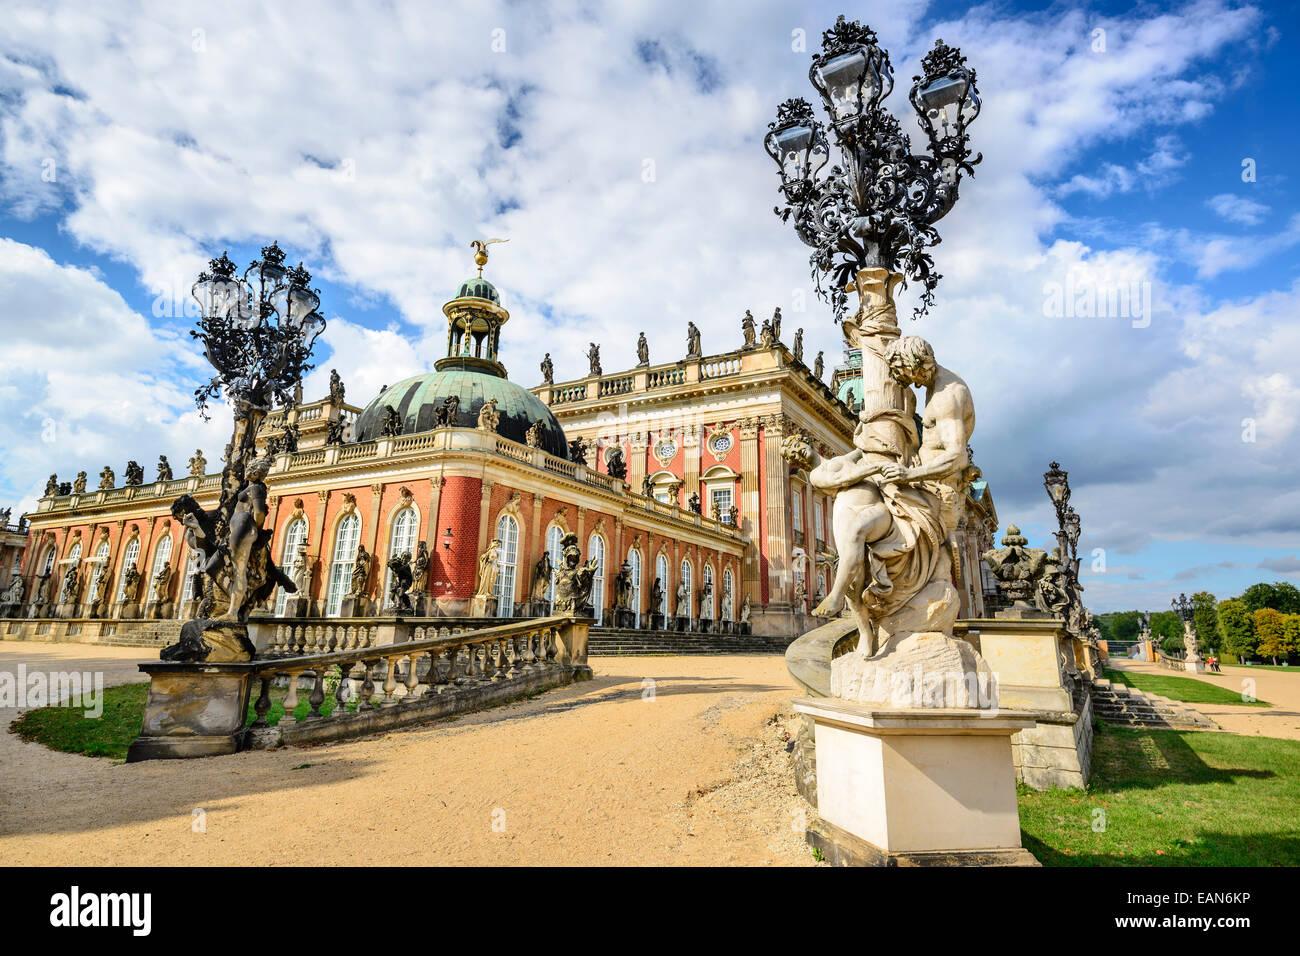 Neues Palais in Potsdam, Germany. - Stock Image